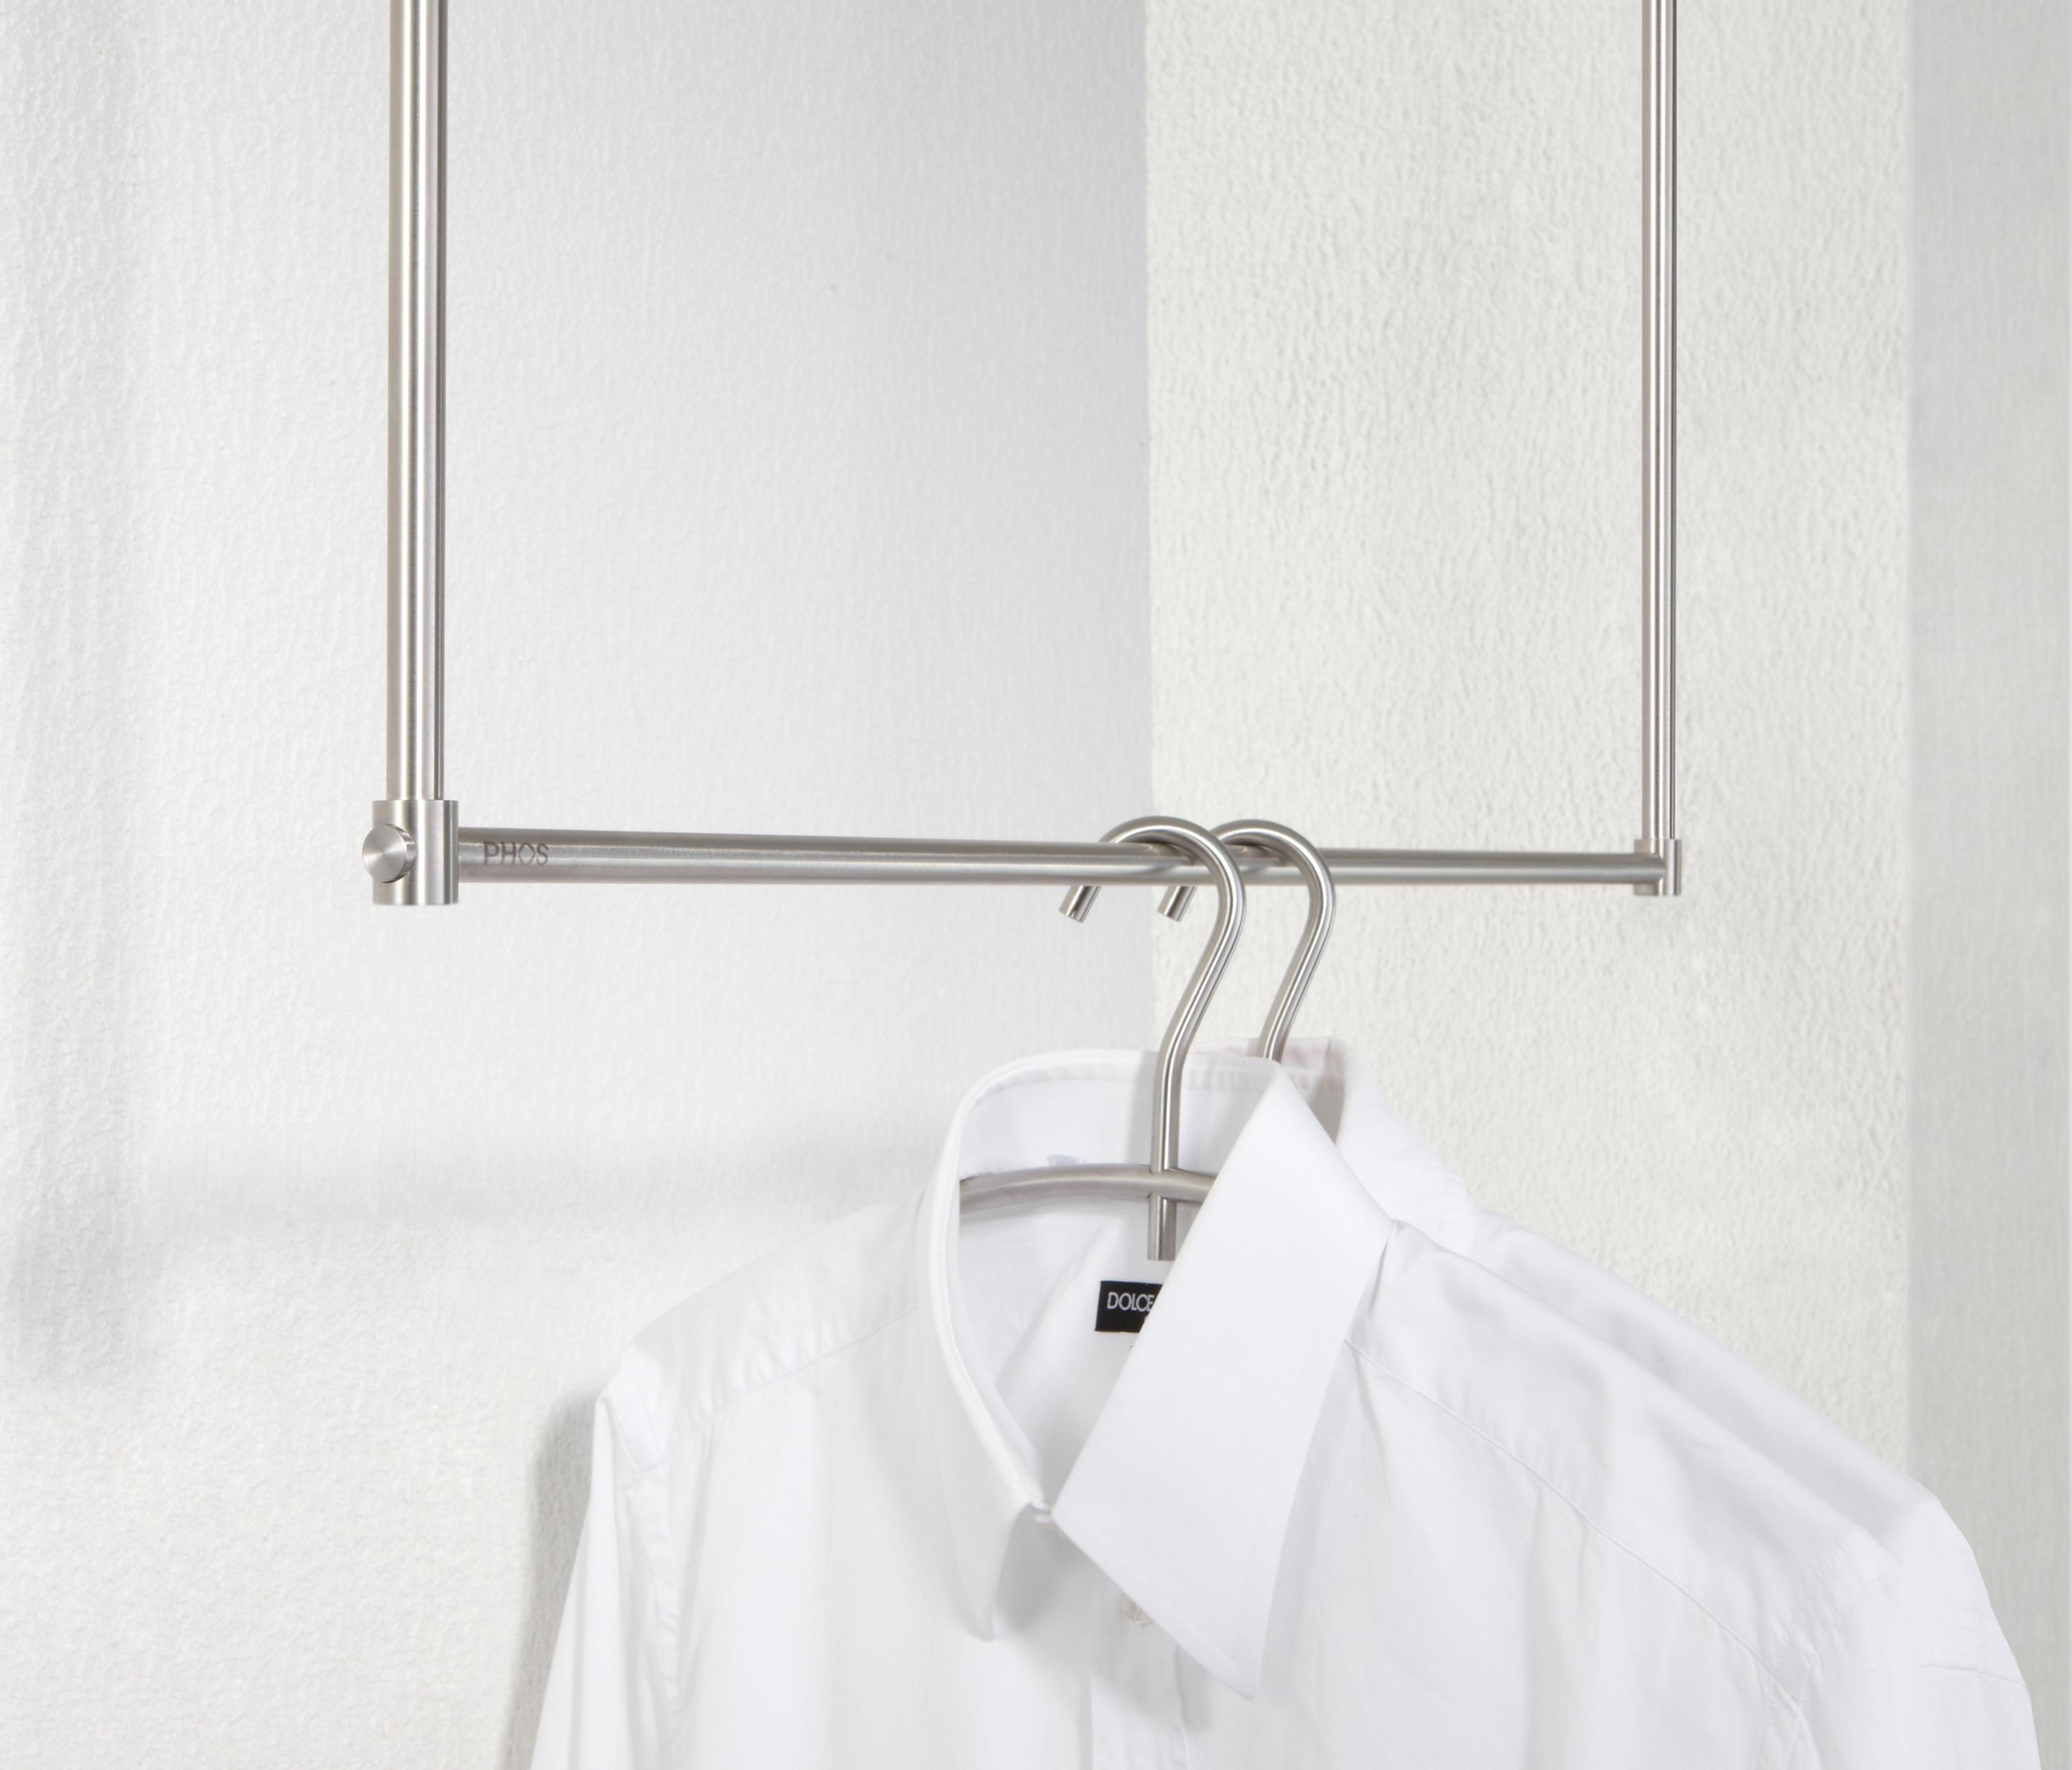 h ngegarderobe take 0 ceiling mounted coat racks from phos design architonic. Black Bedroom Furniture Sets. Home Design Ideas